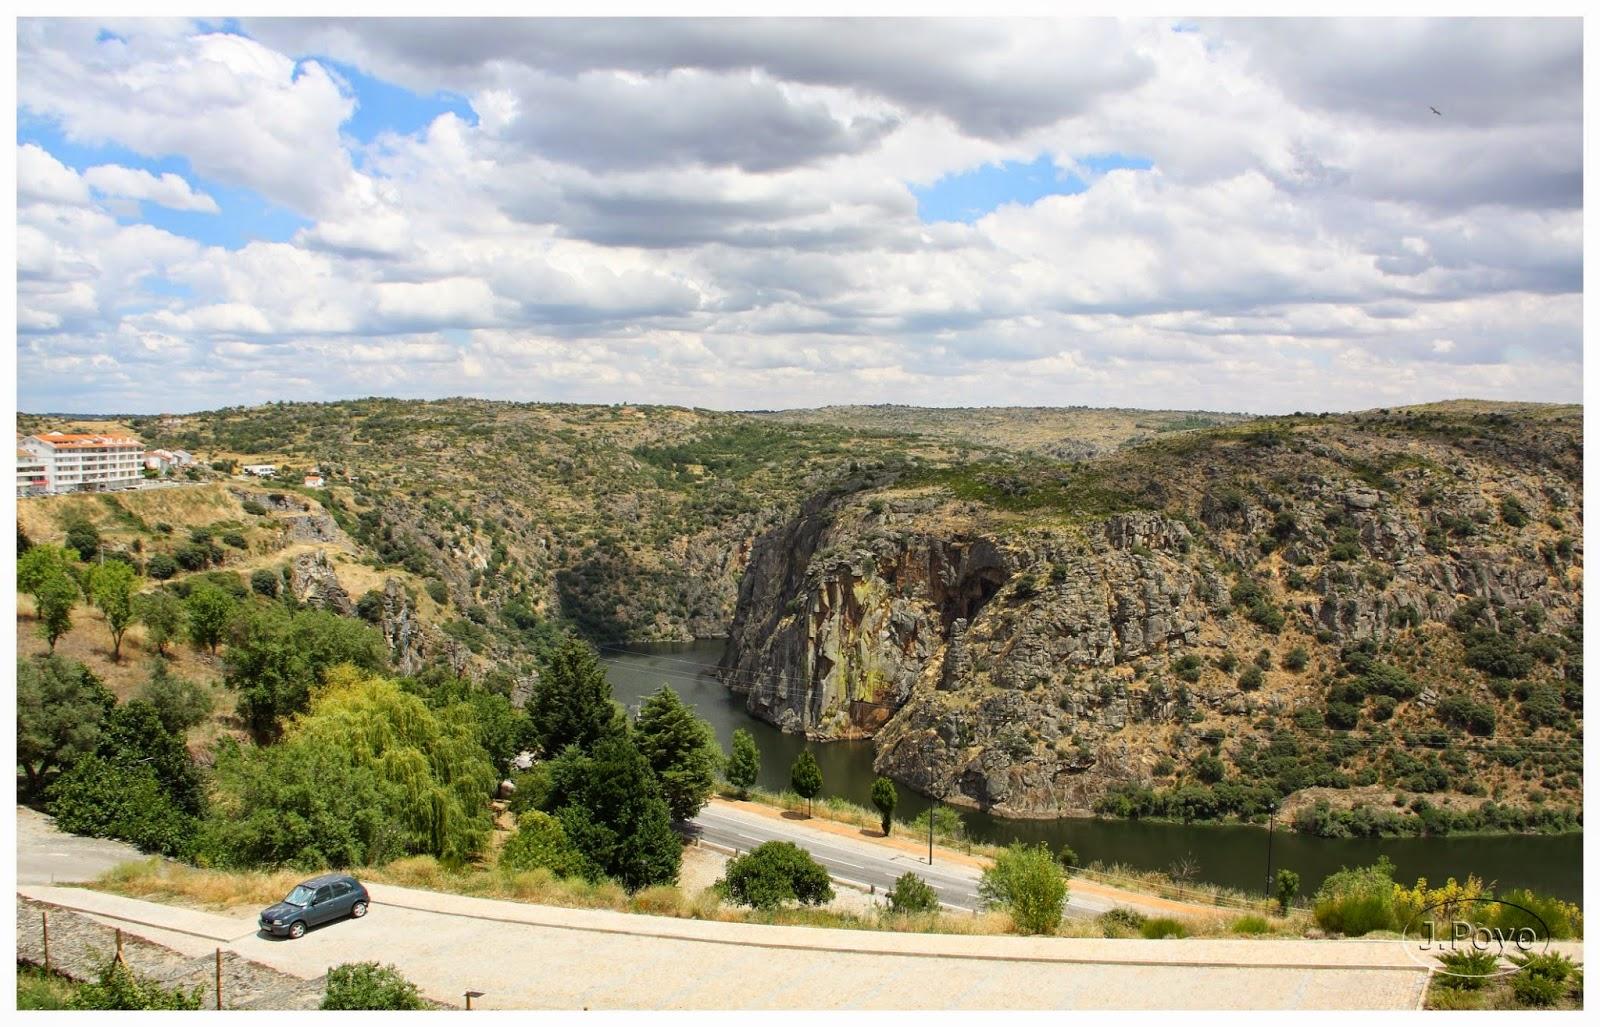 Vista del río Duero desde Miranda do Douro, Portugal